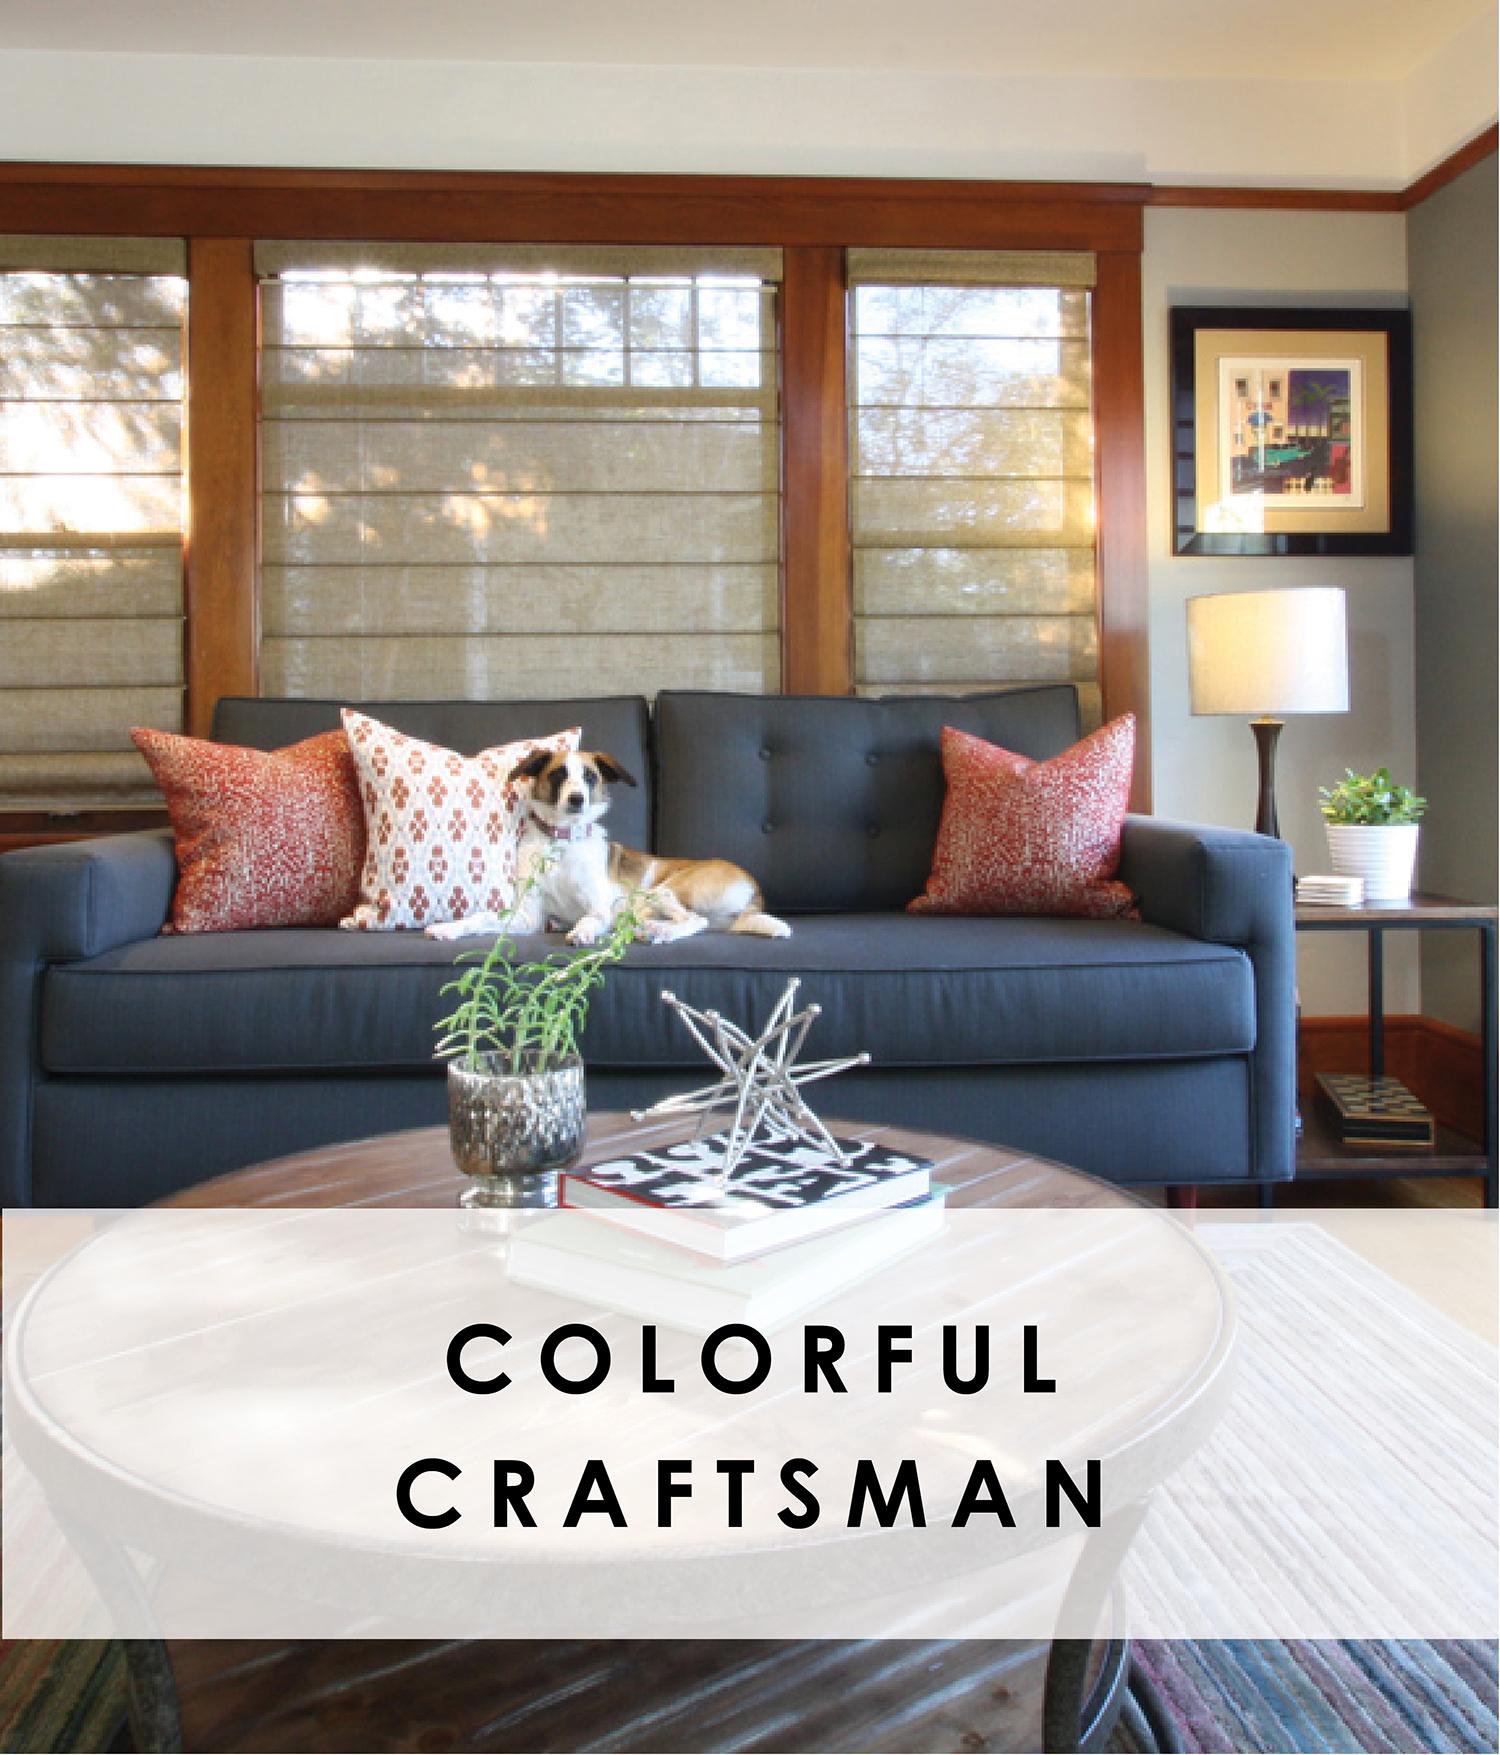 Colorful Craftsman.jpg